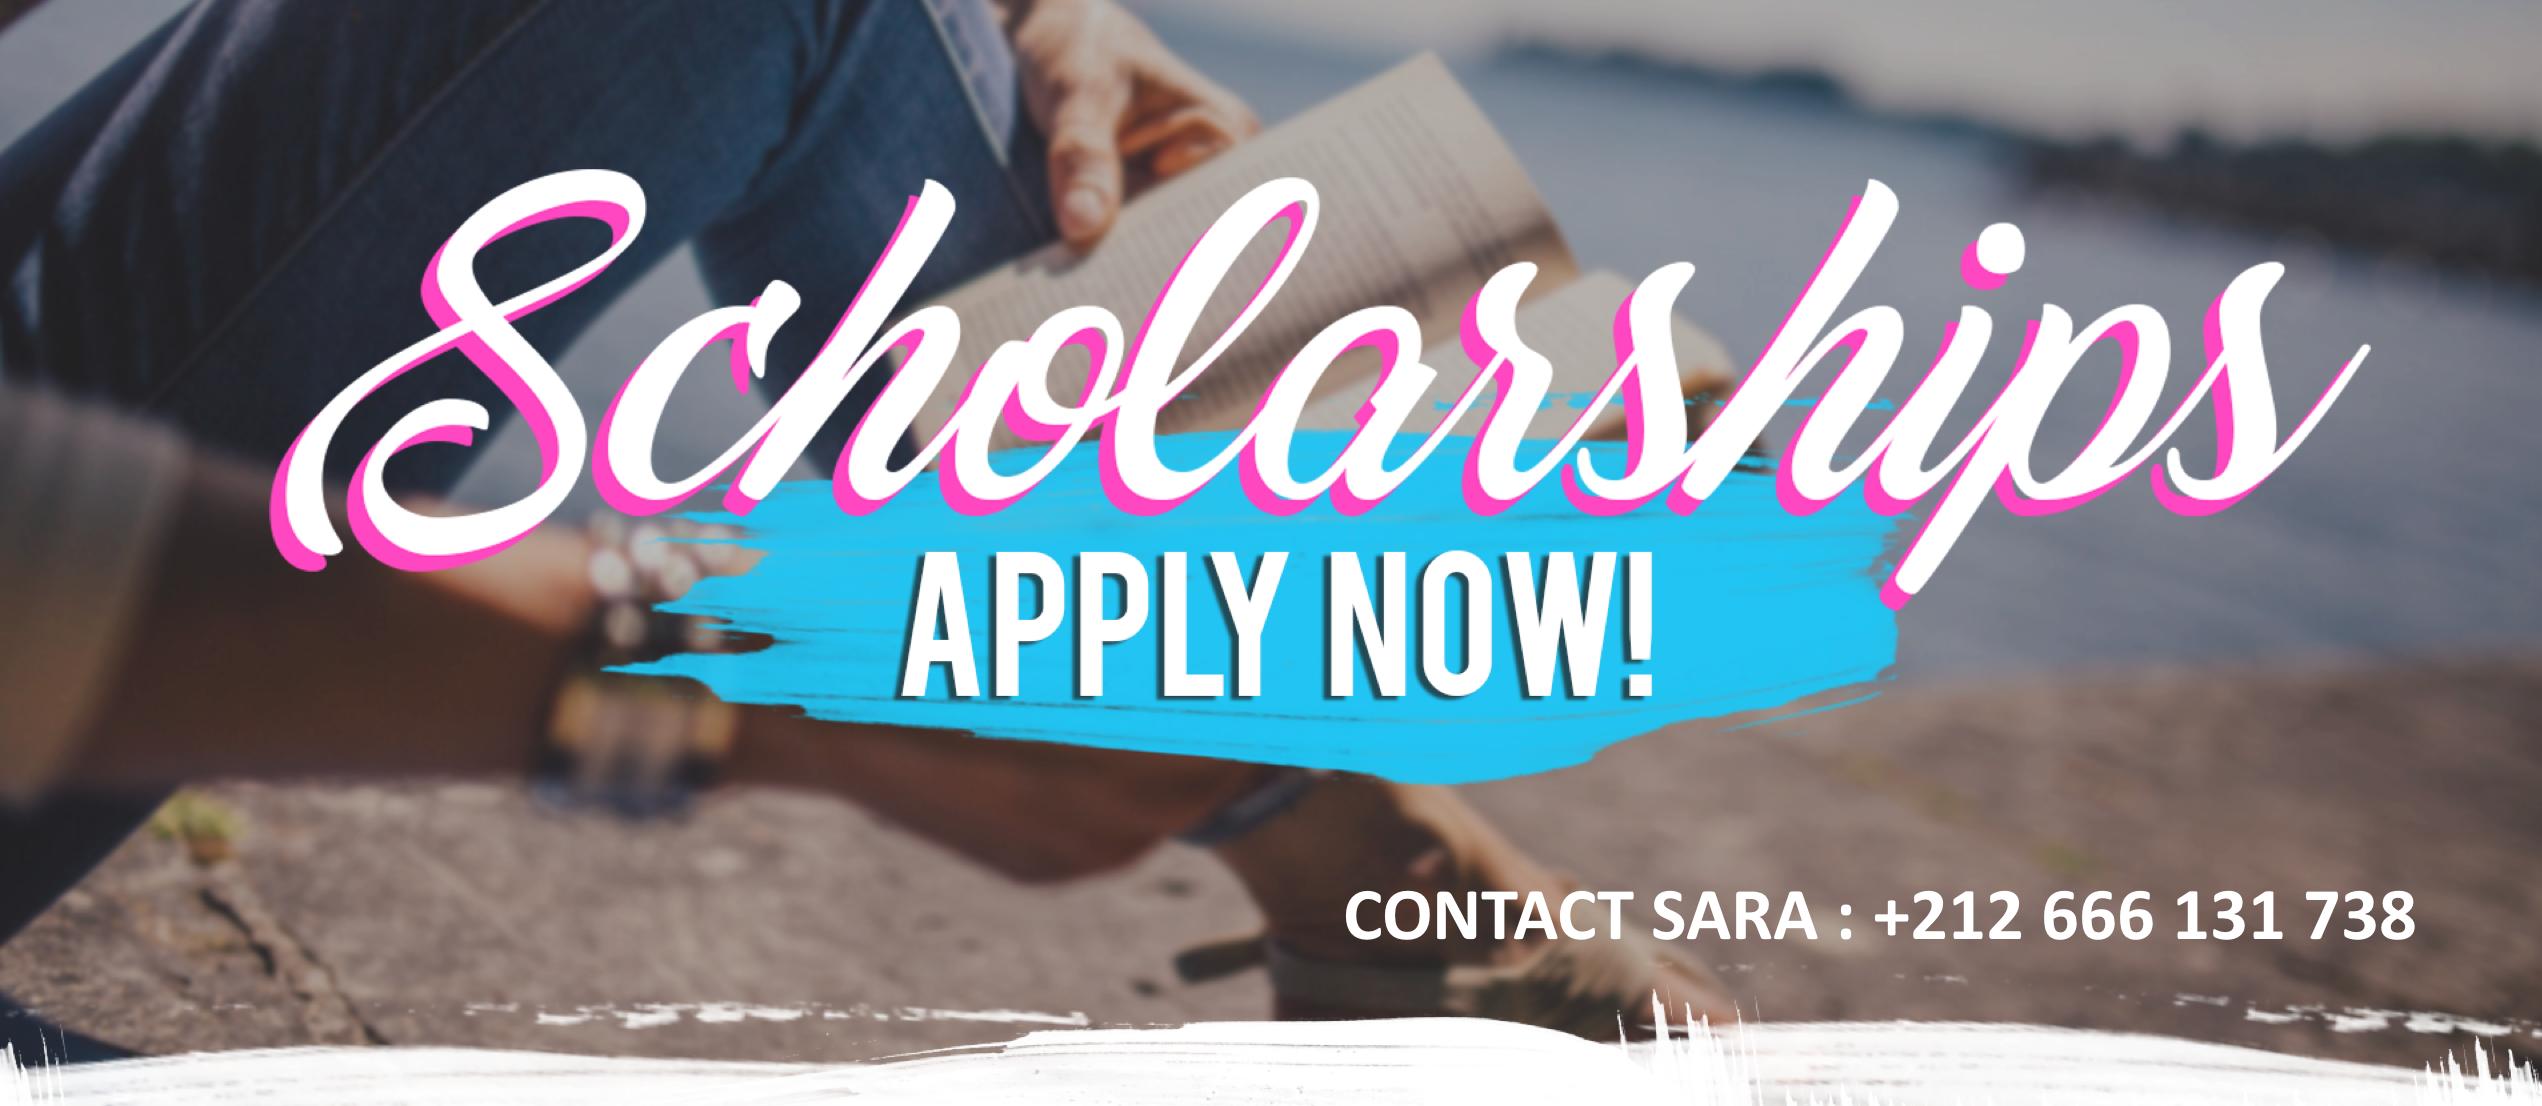 Scholarships - CasaEducation